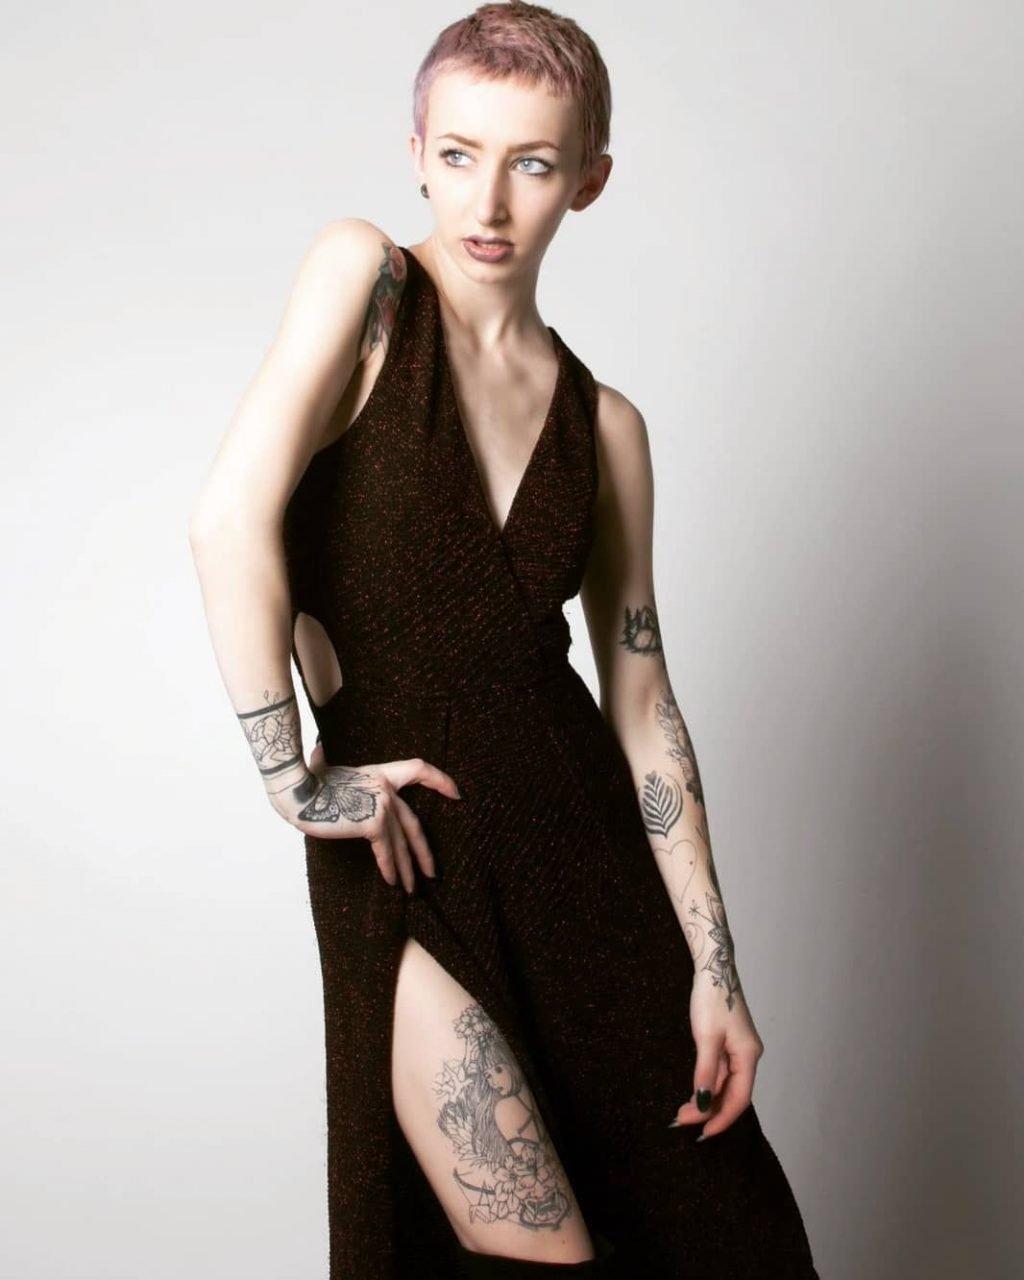 Katex Nude & Sexy (153 Photos)